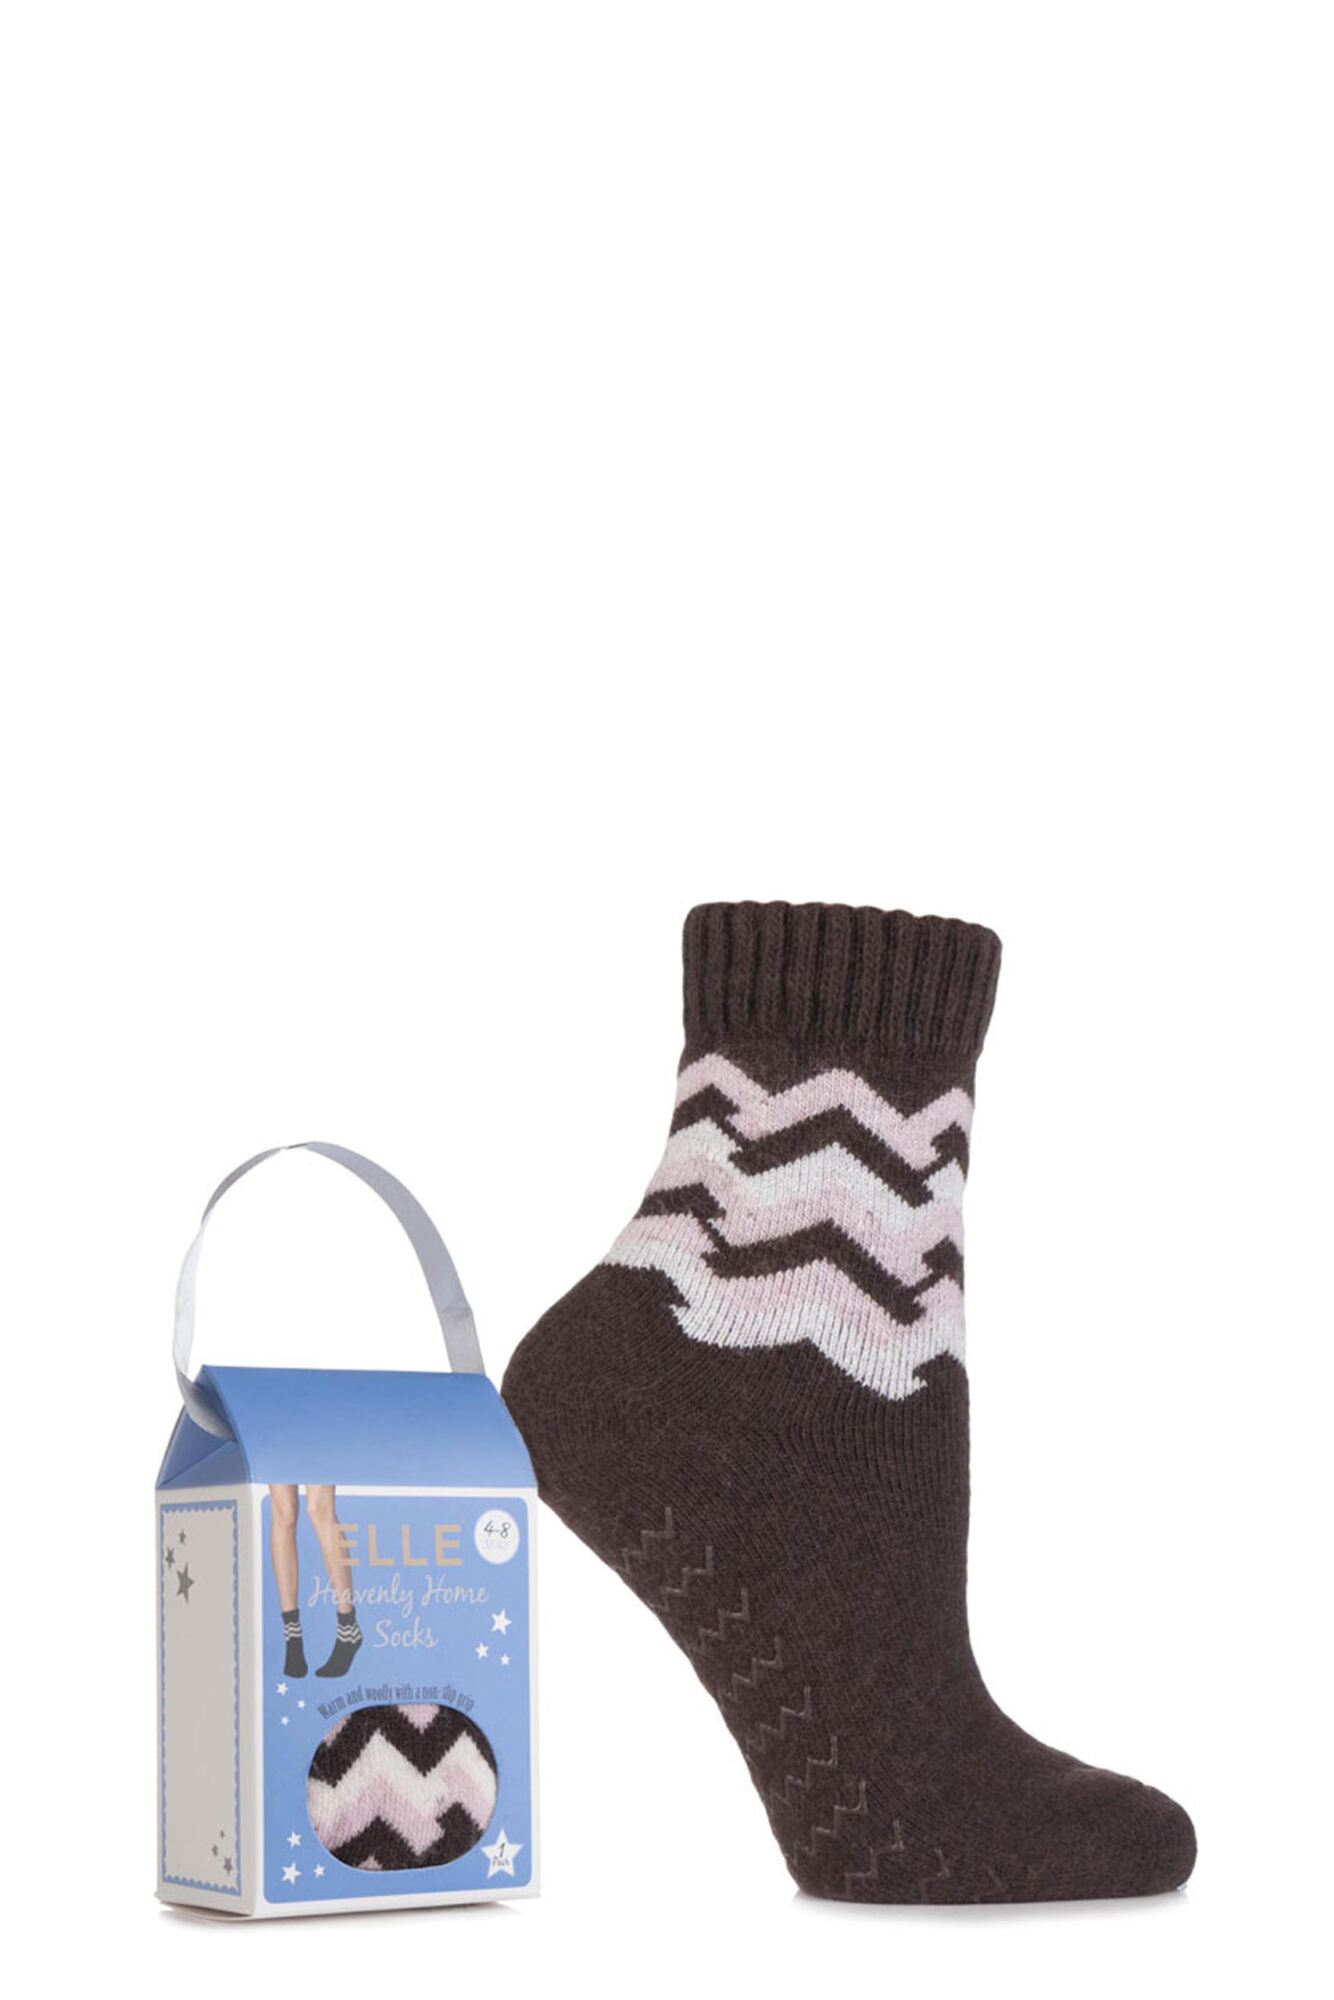 1 Pair Gift Boxed Wool Blend Zig Zag Slipper Socks Ladies - Elle